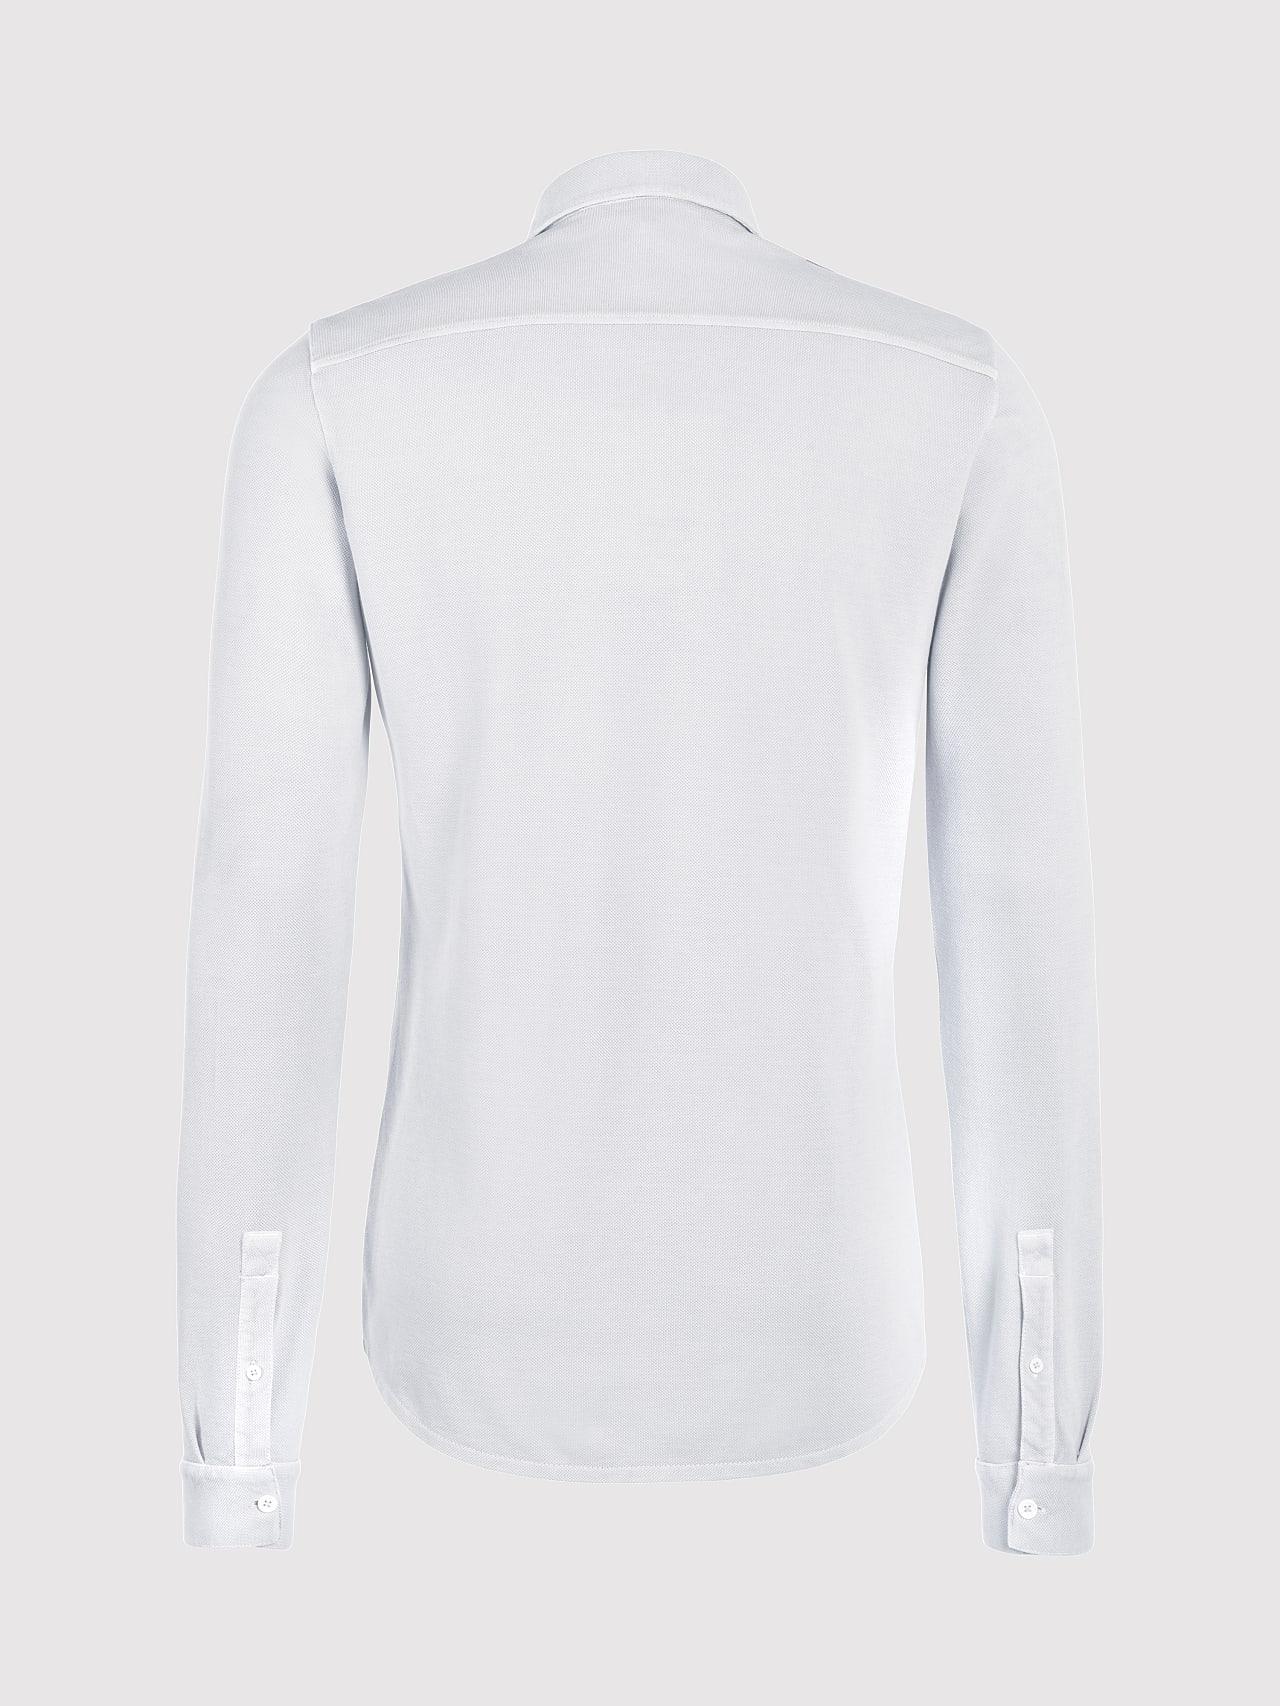 JIQUE V1.Y5.01 Pique Shirt with Kent Collar white Left Alpha Tauri